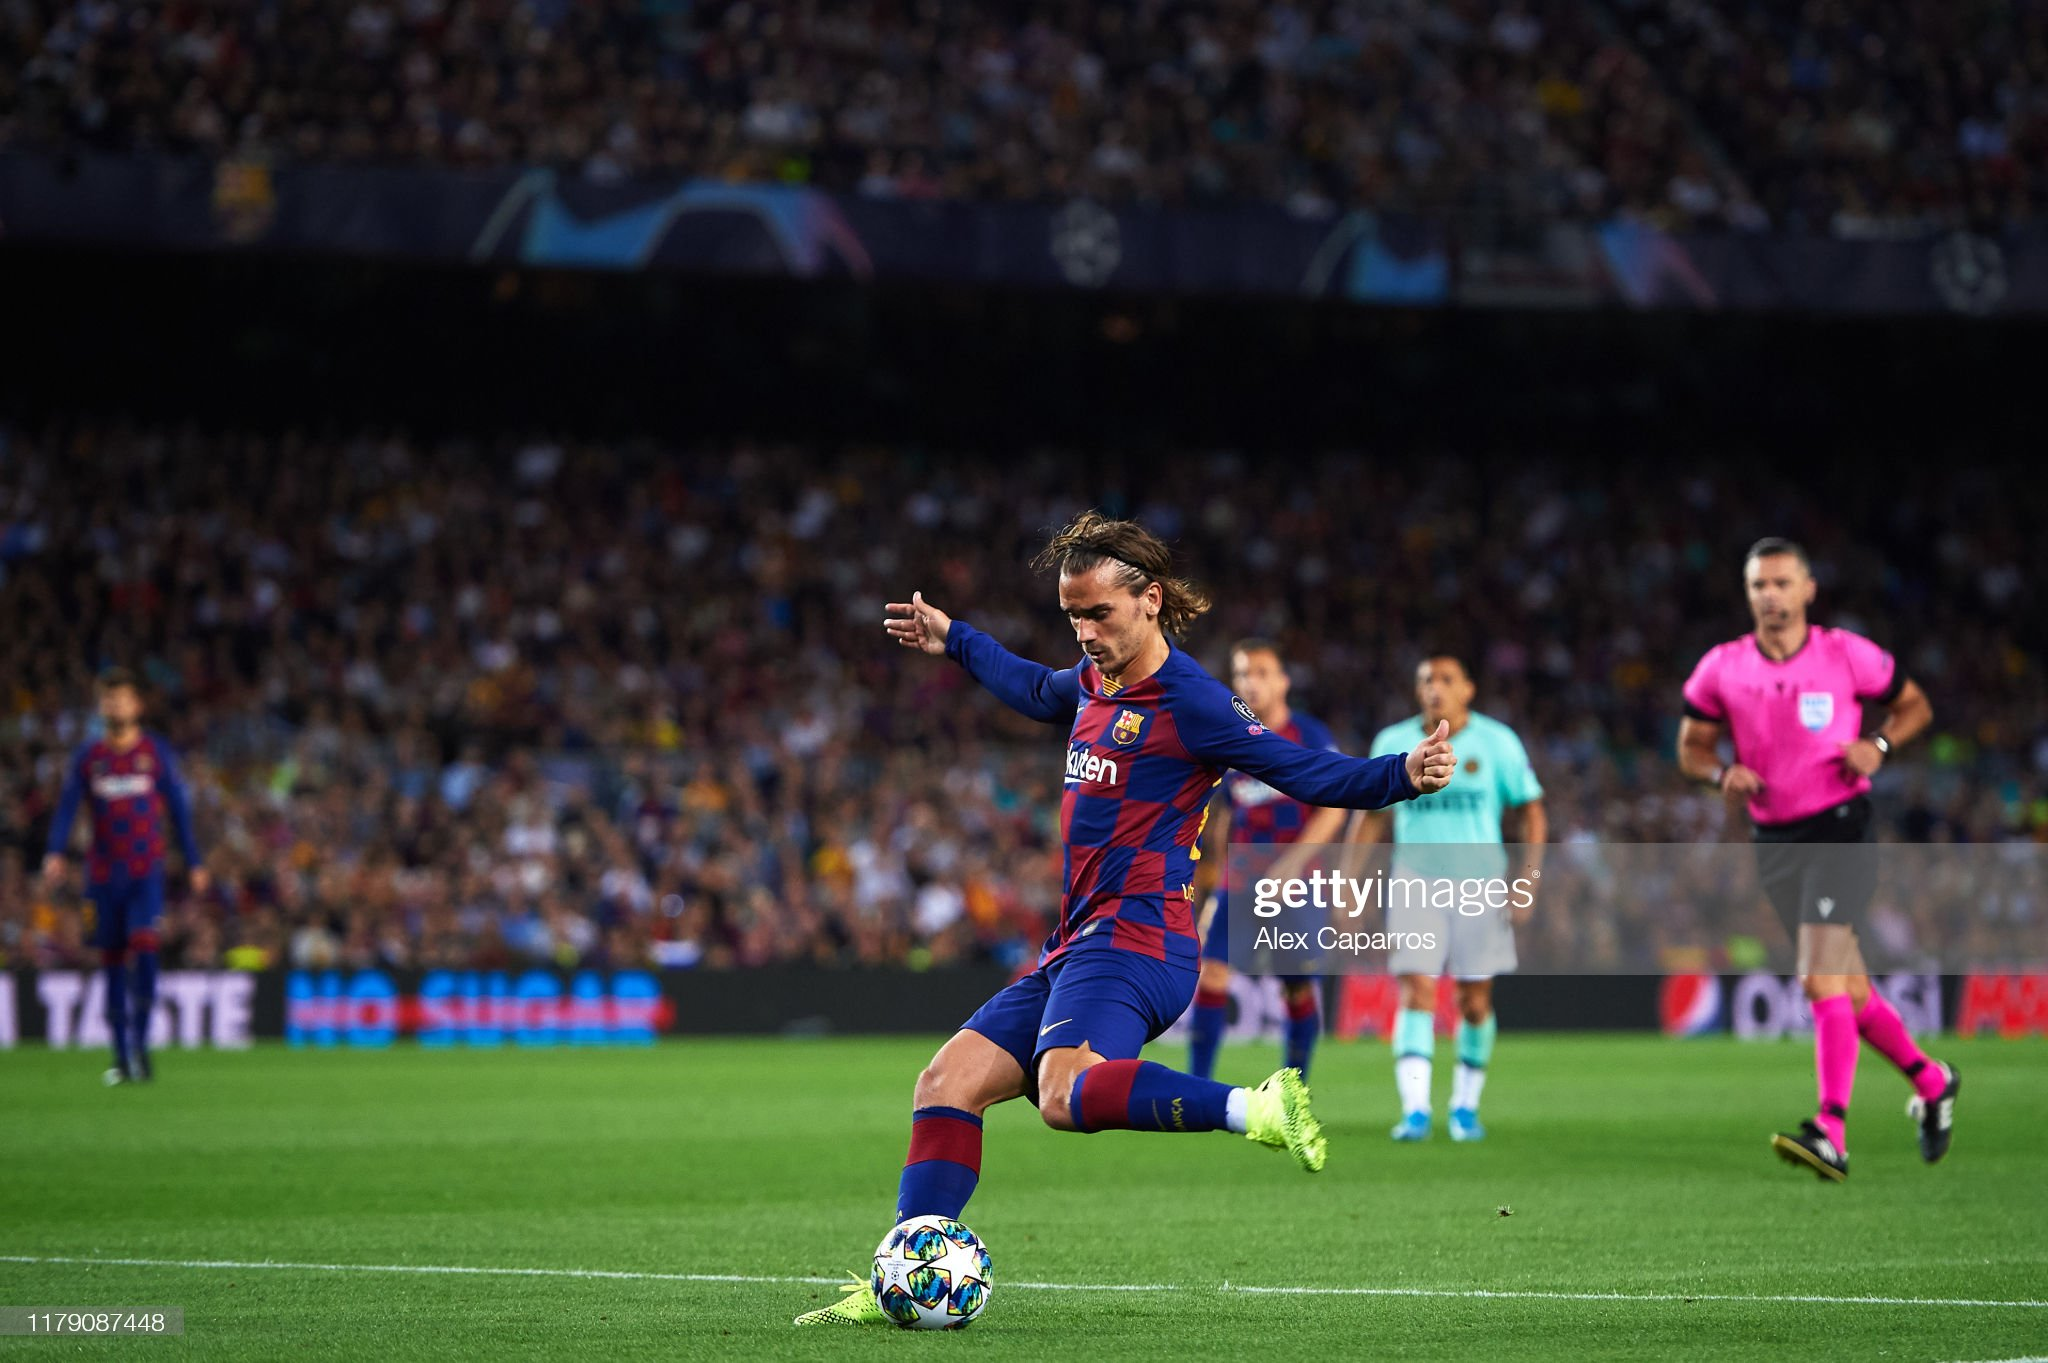 صور مباراة : برشلونة - إنتر 2-1 ( 02-10-2019 )  Antoine-griezmann-of-fc-barcelona-kicks-the-ball-during-the-uefa-f-picture-id1179087448?s=2048x2048